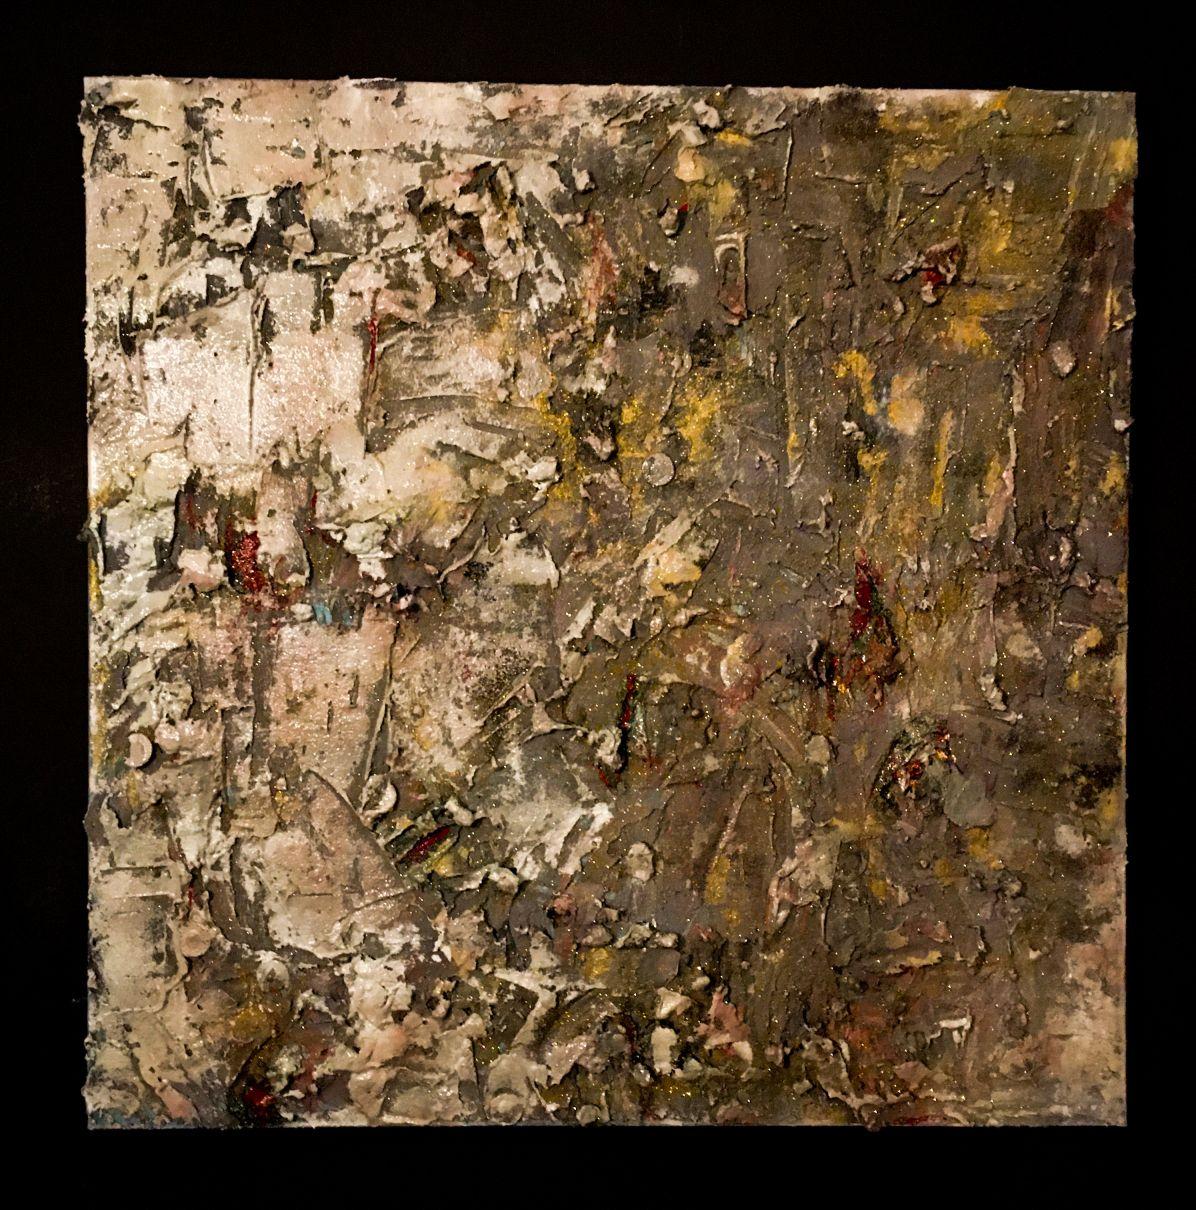 Animabus Caelorum (2020) - Melanie Belmonte